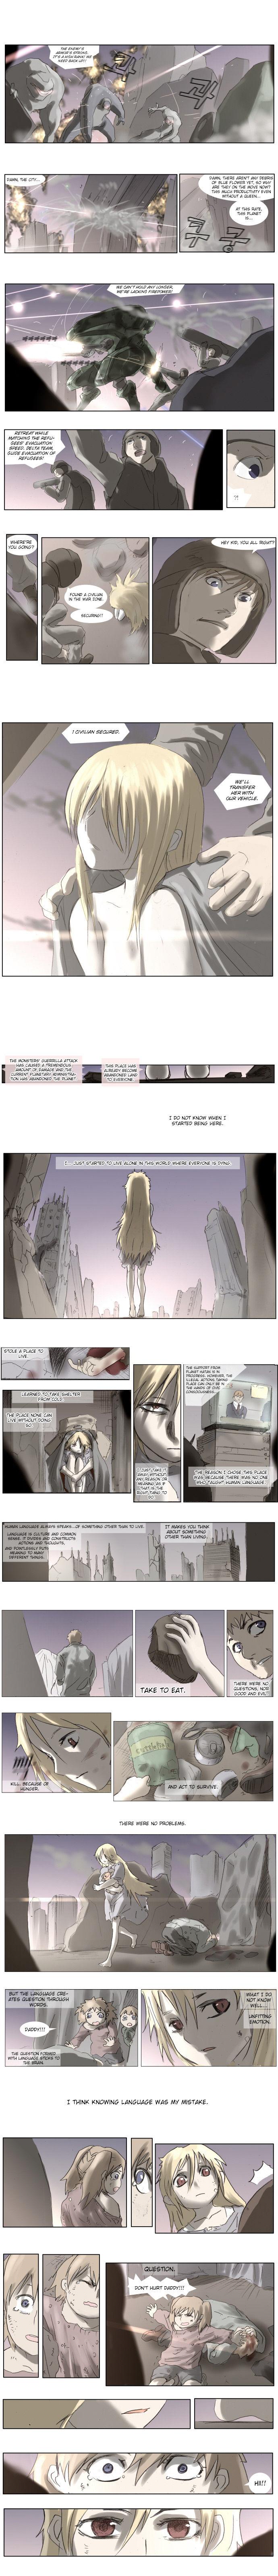 Knight Run 52 Page 2